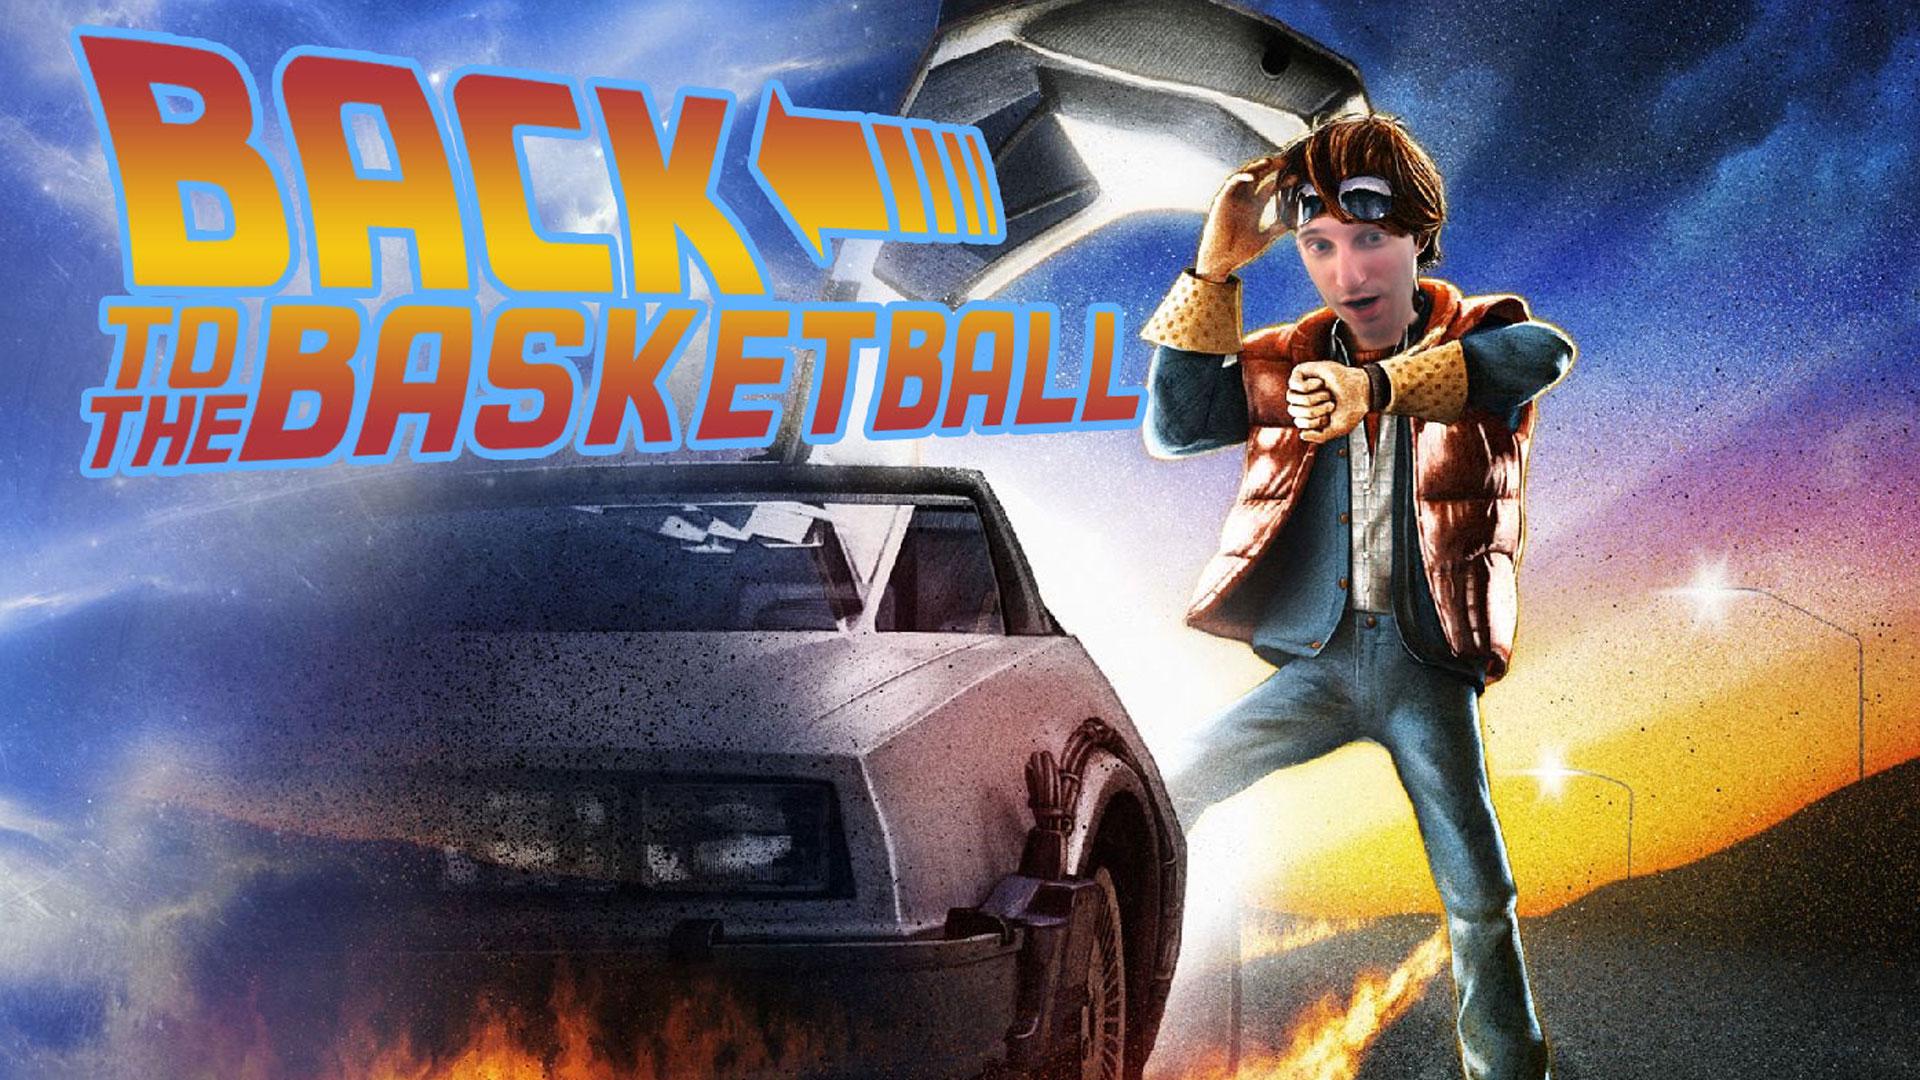 Back to the Basketball